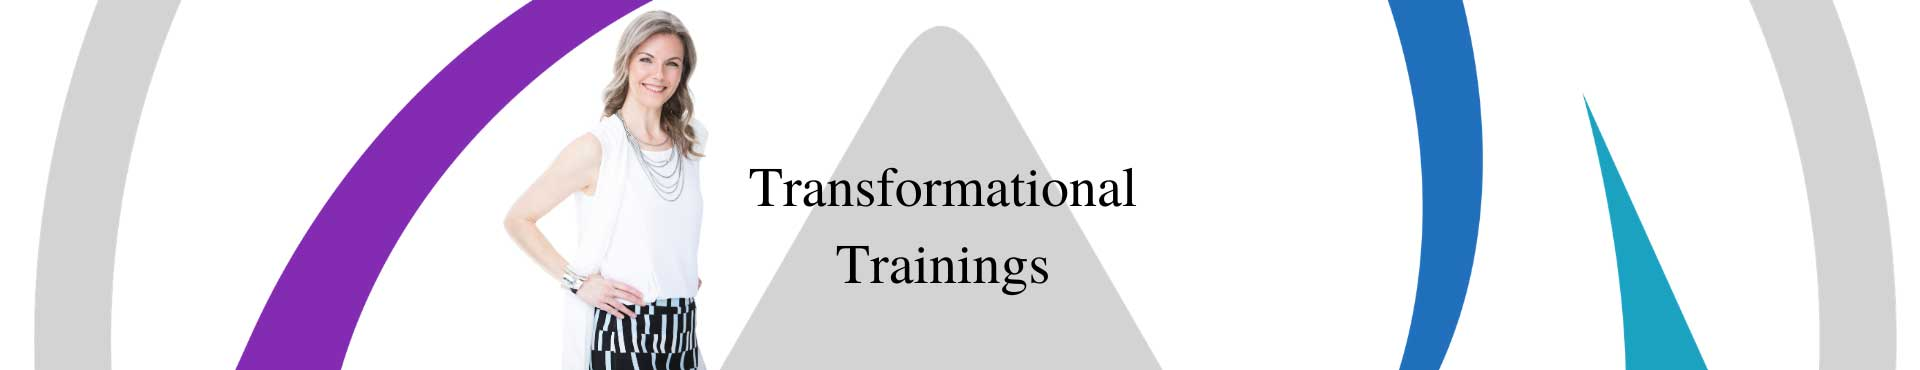 New--Transformational-Trainings-Header